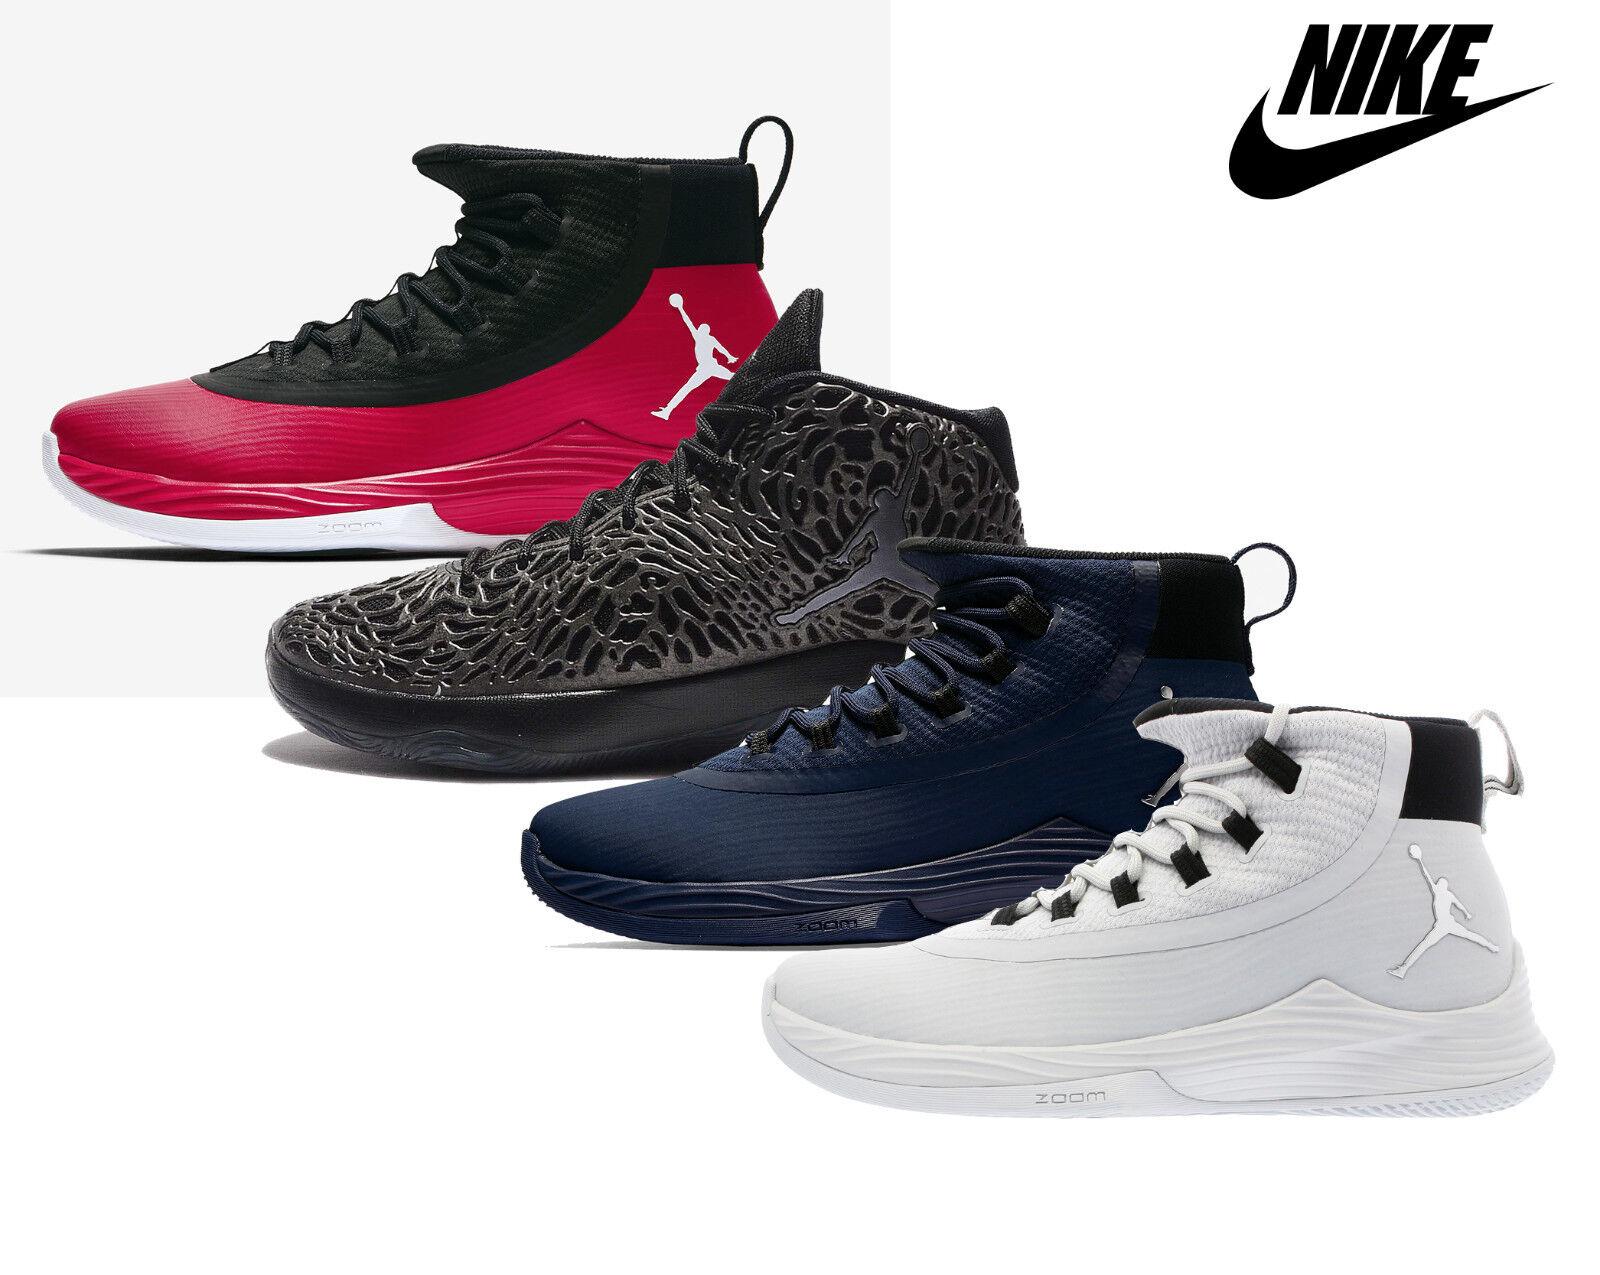 Nike Jordan Ultra Fly Basketball Shoes NIKE Jordan Sneakers NEW Comfortable and good-looking